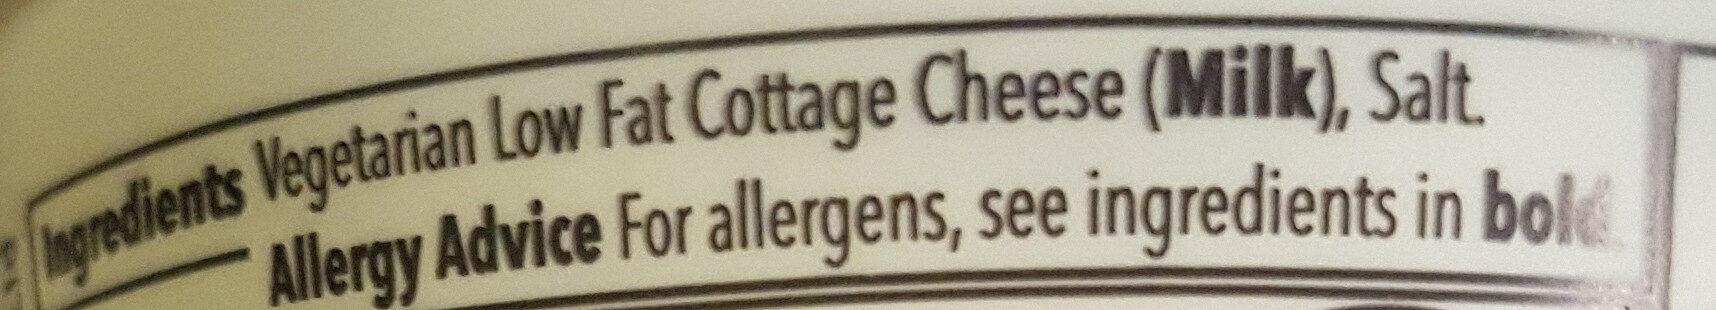 Natural cottage cheese - Ingredientes - en